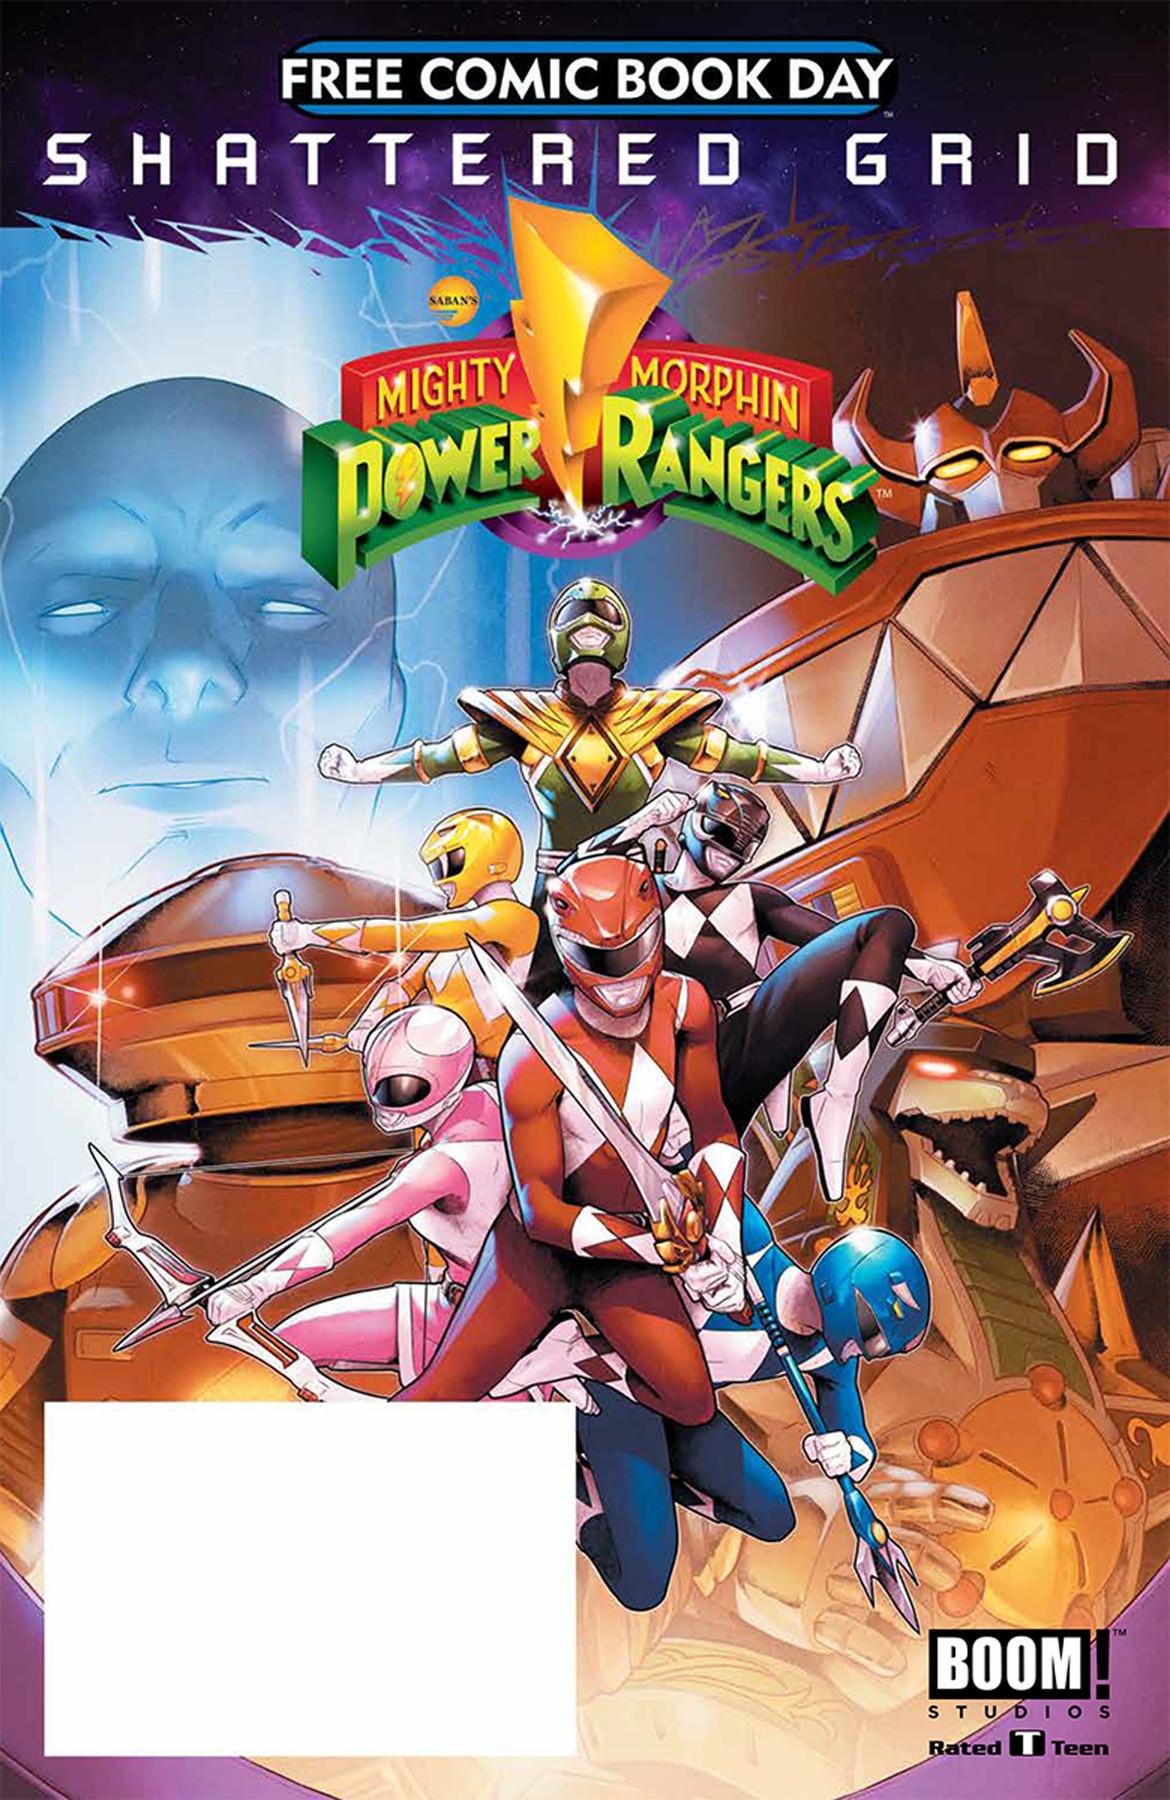 Power Rangers FCBD 2018